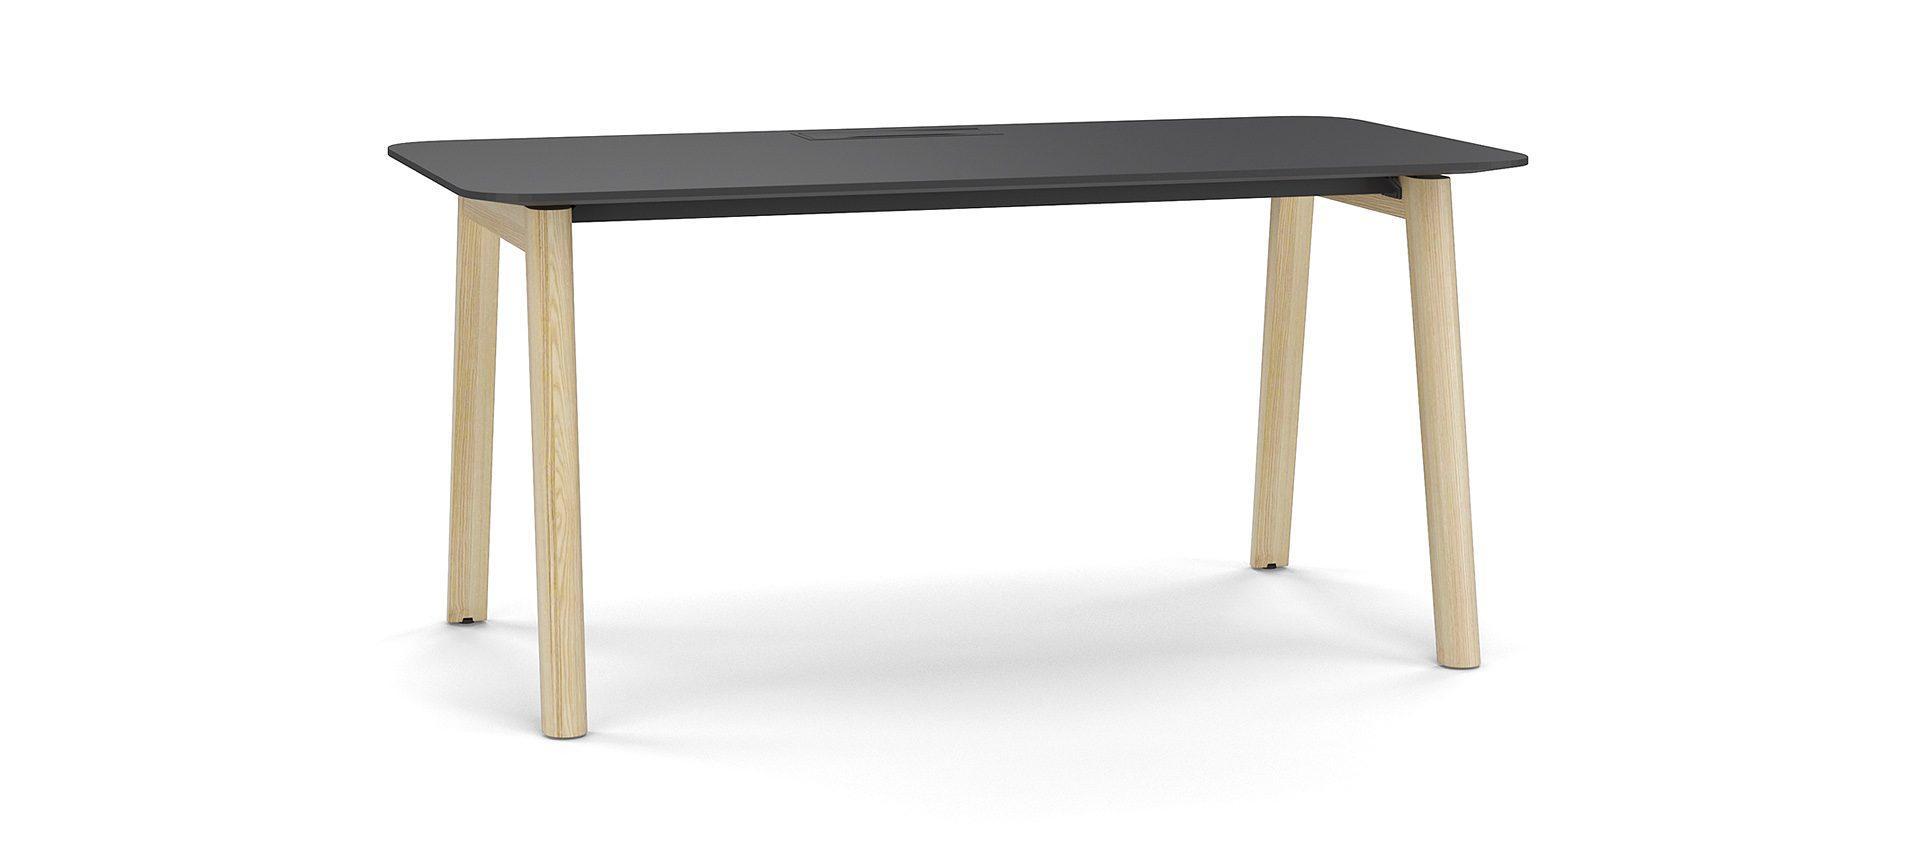 Stupendous Nova Wood Narbutas Creativecarmelina Interior Chair Design Creativecarmelinacom